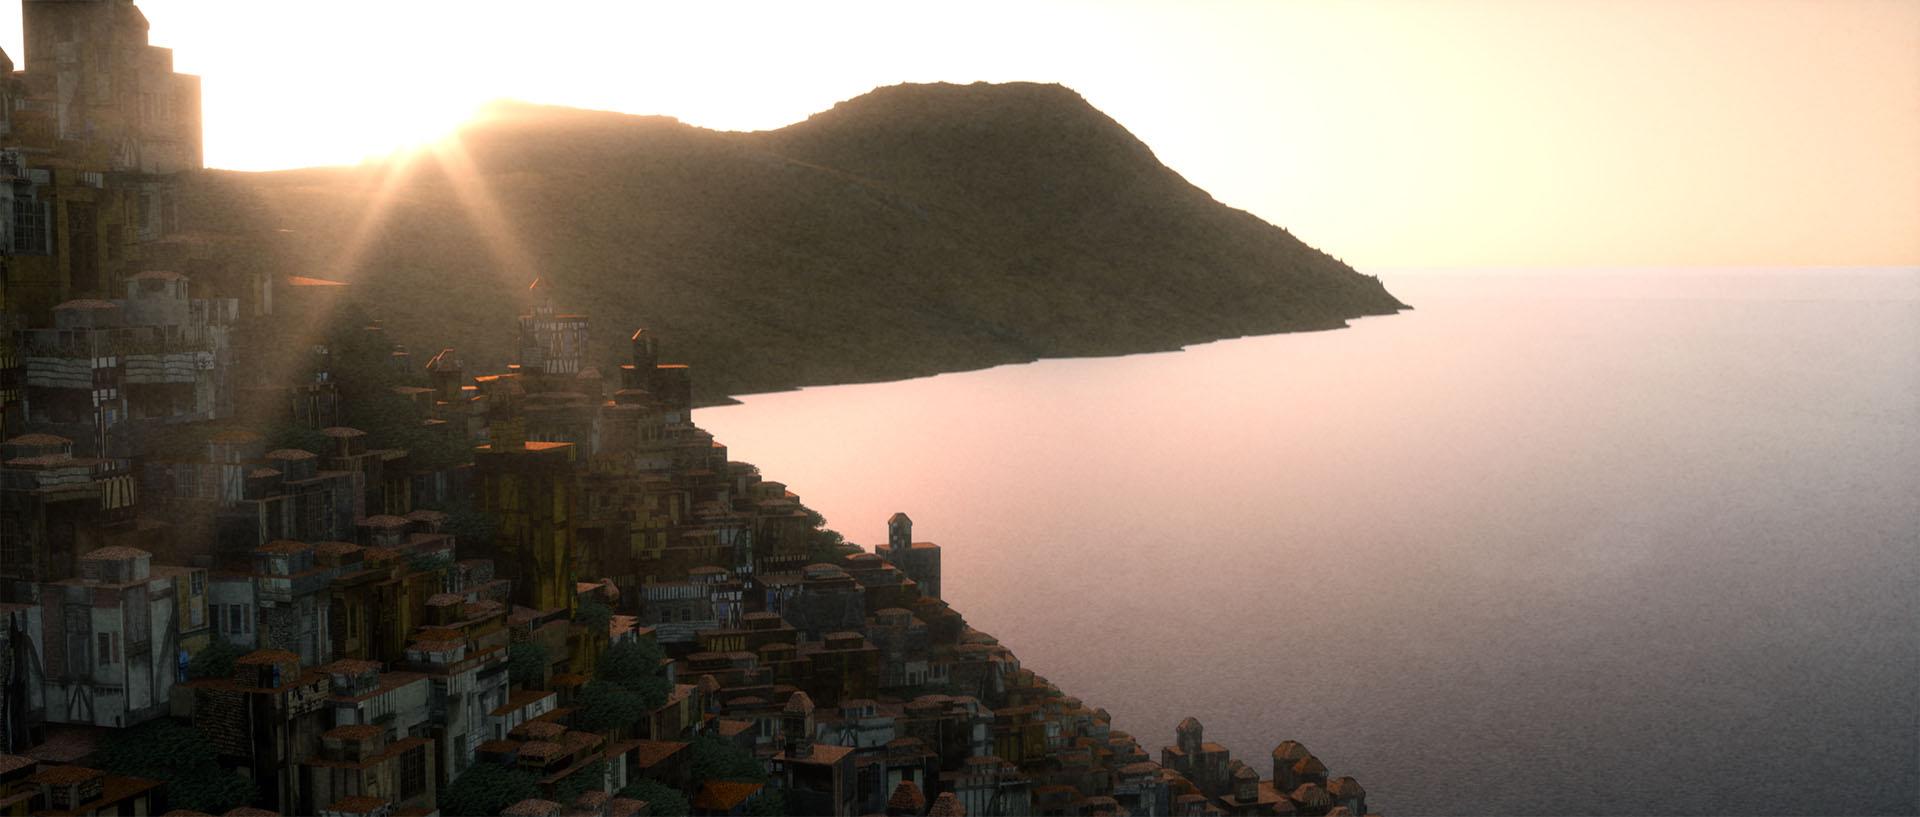 181028 Hill City1.jpg